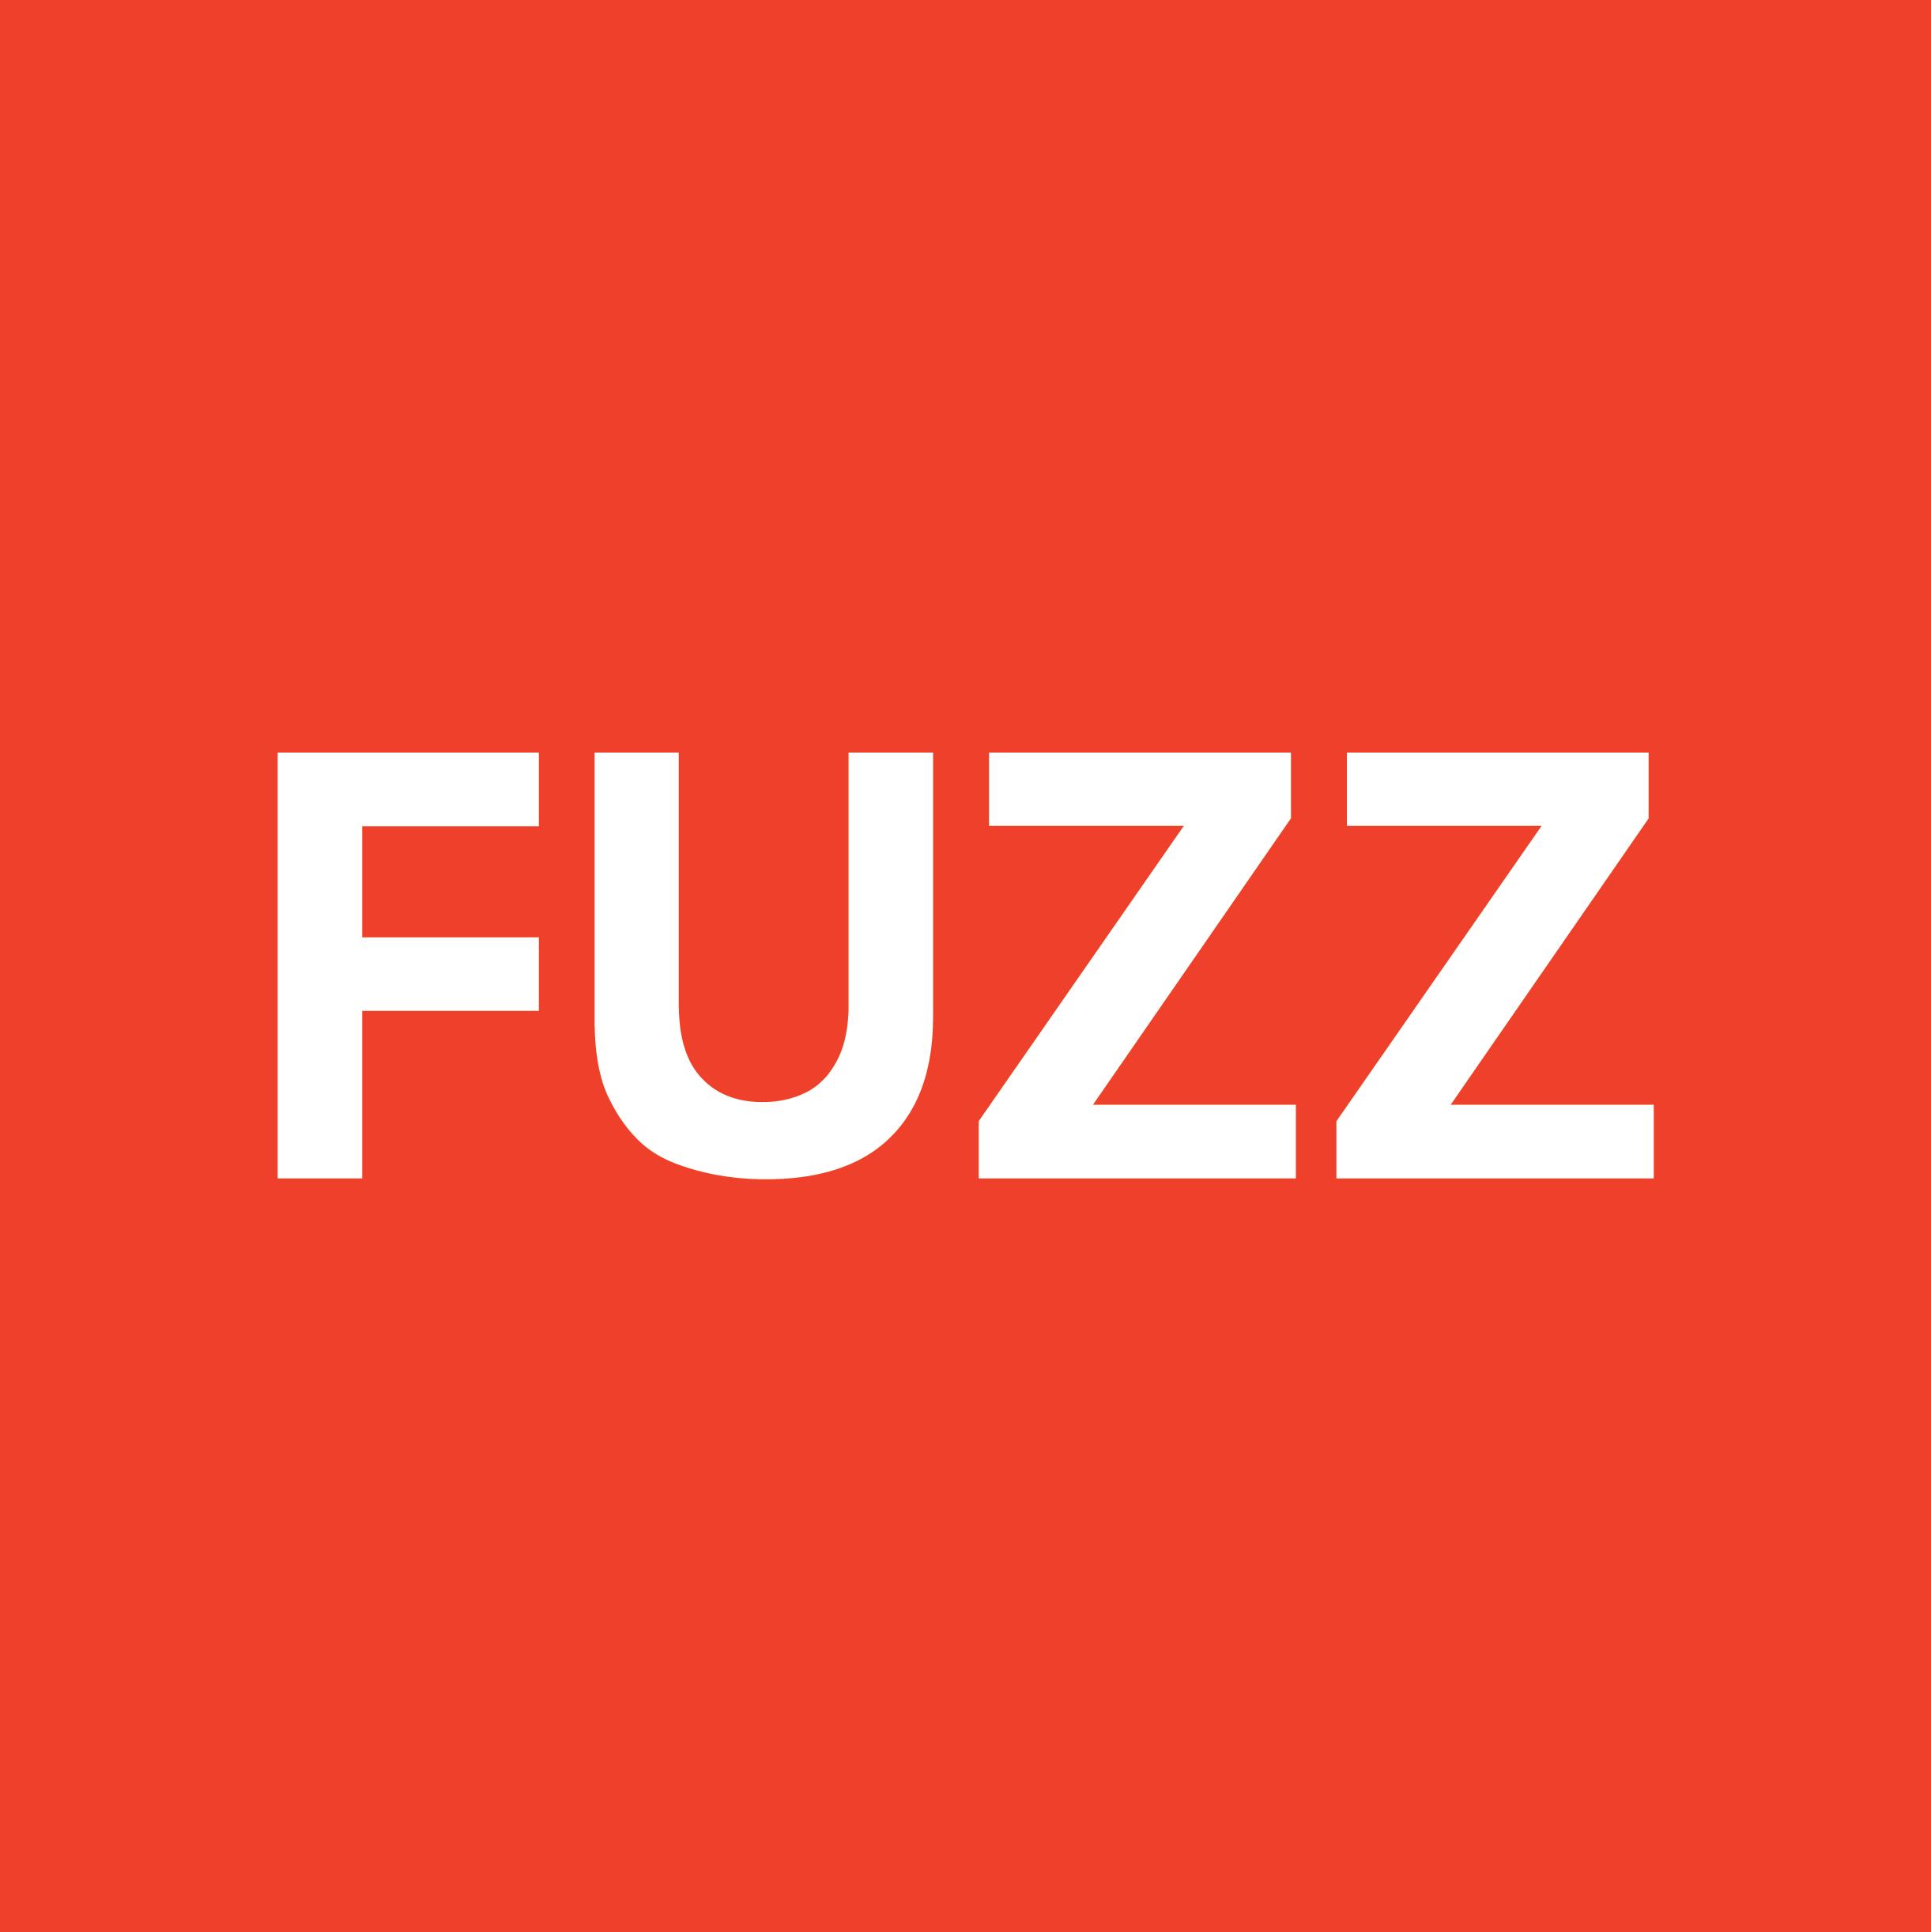 Fuzz Logo